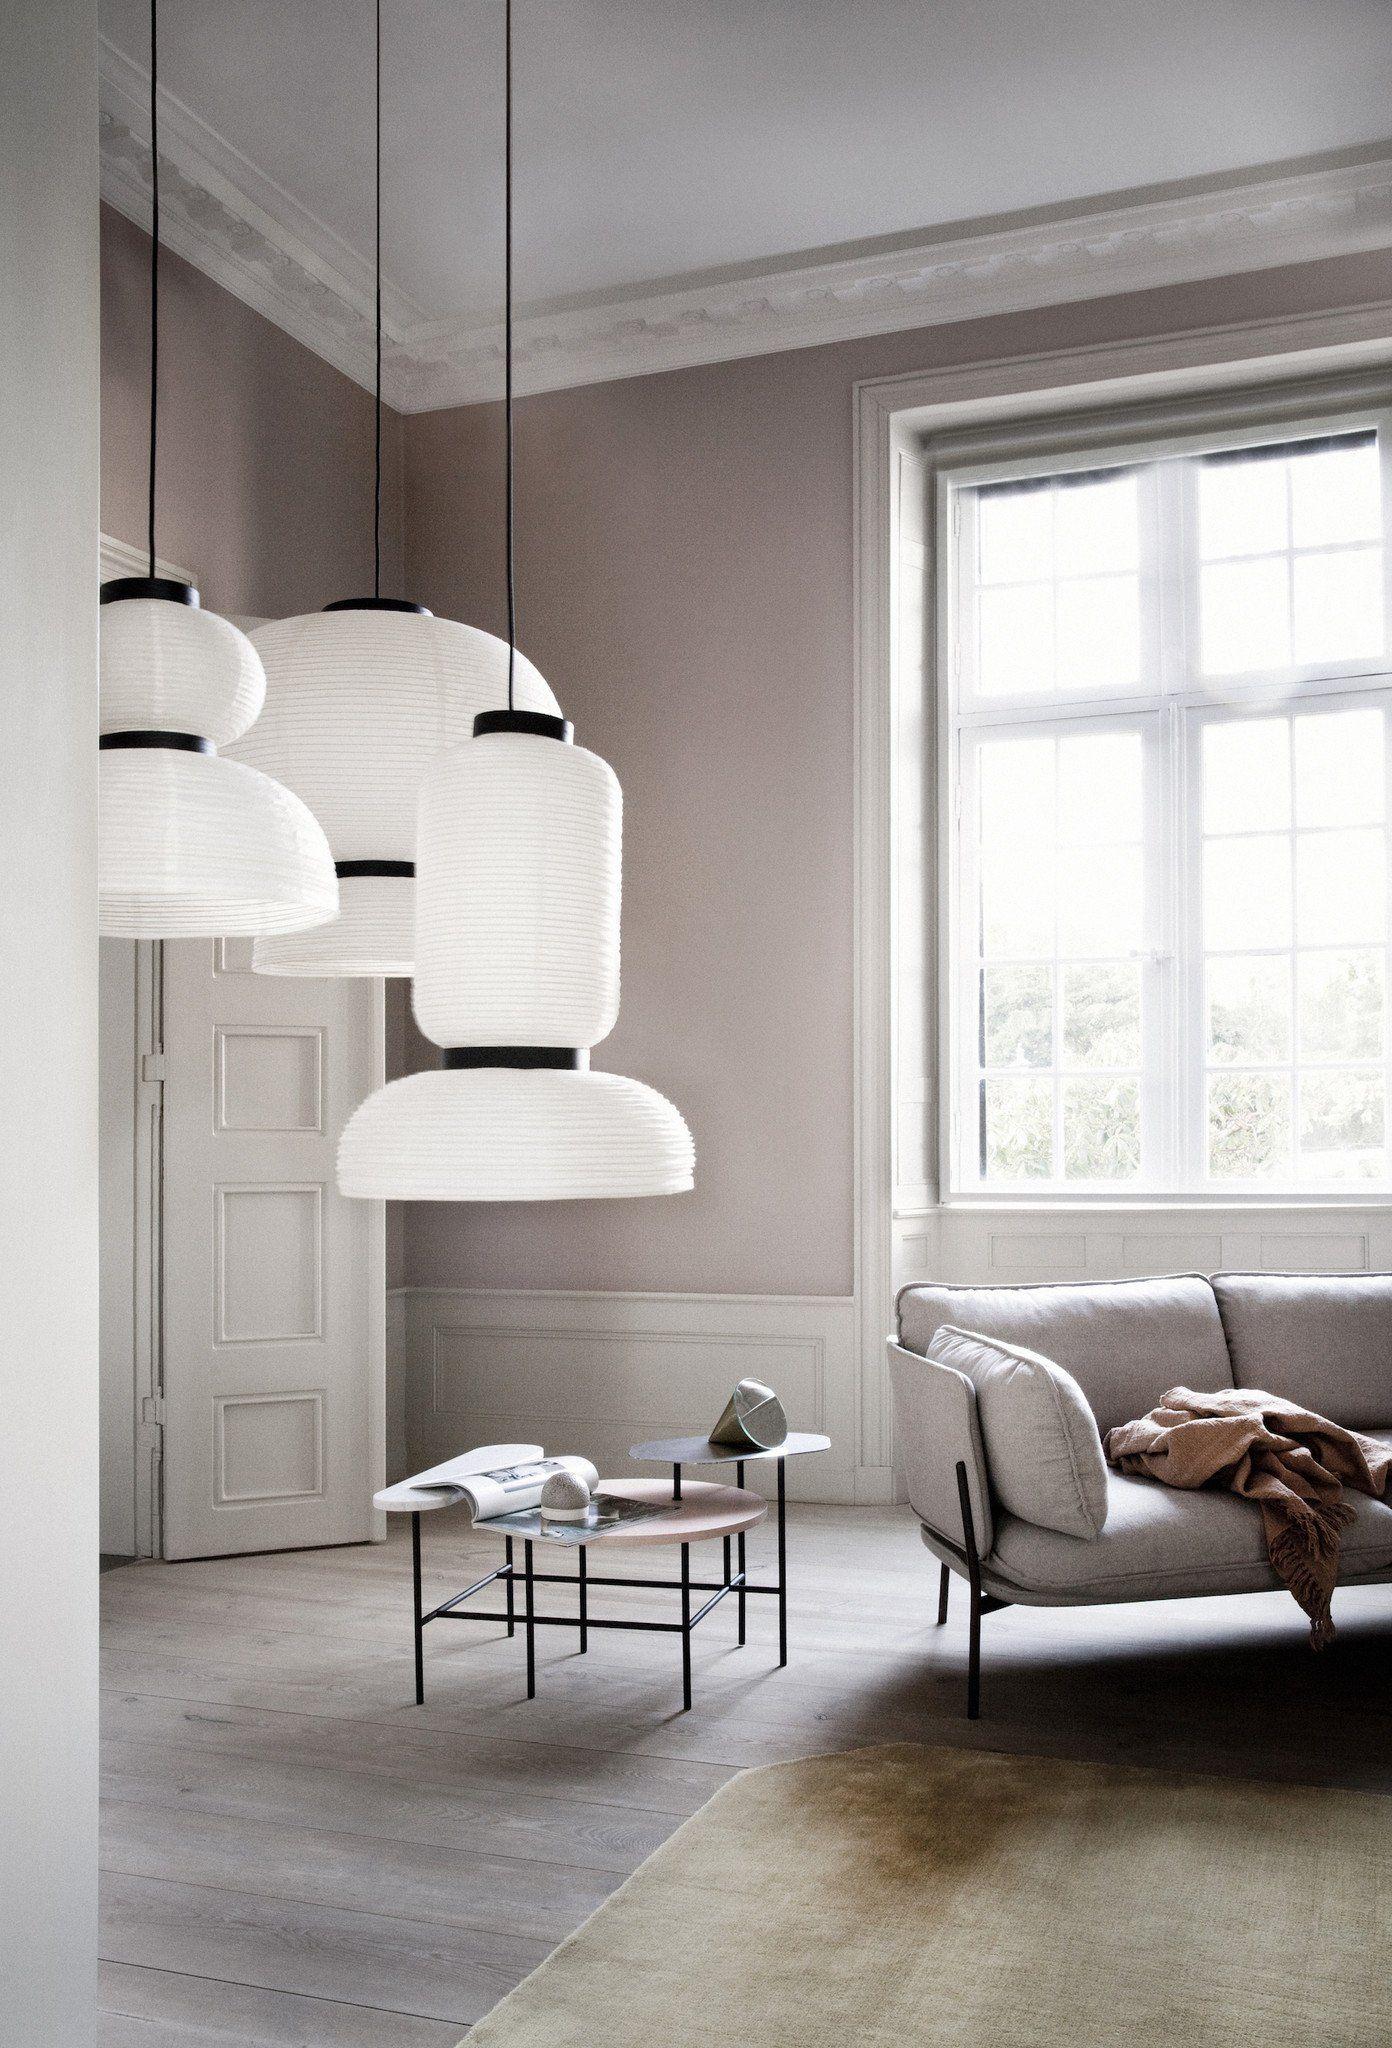 Formakami Pendant Jh3 Lampa Tradition Scandinavian Living Interior Design Interior Interior Design Trends